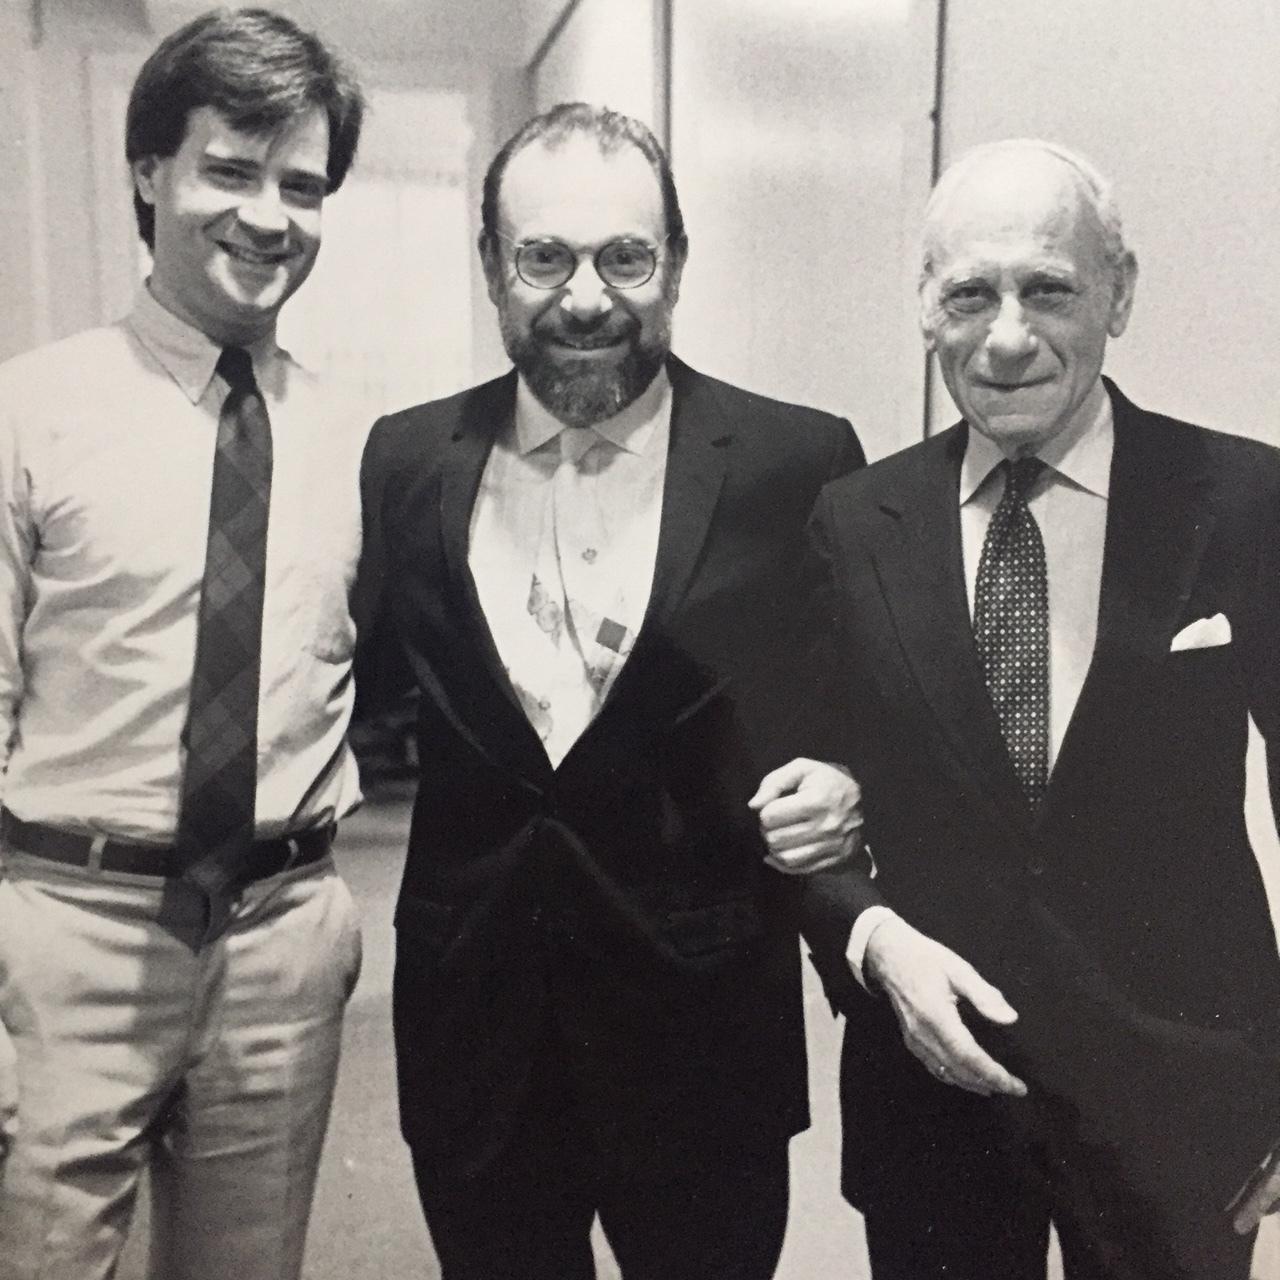 John Lee, Osvaldo Romberg, Tibor De Nagy from John's days as director of the De Nagy Gallery